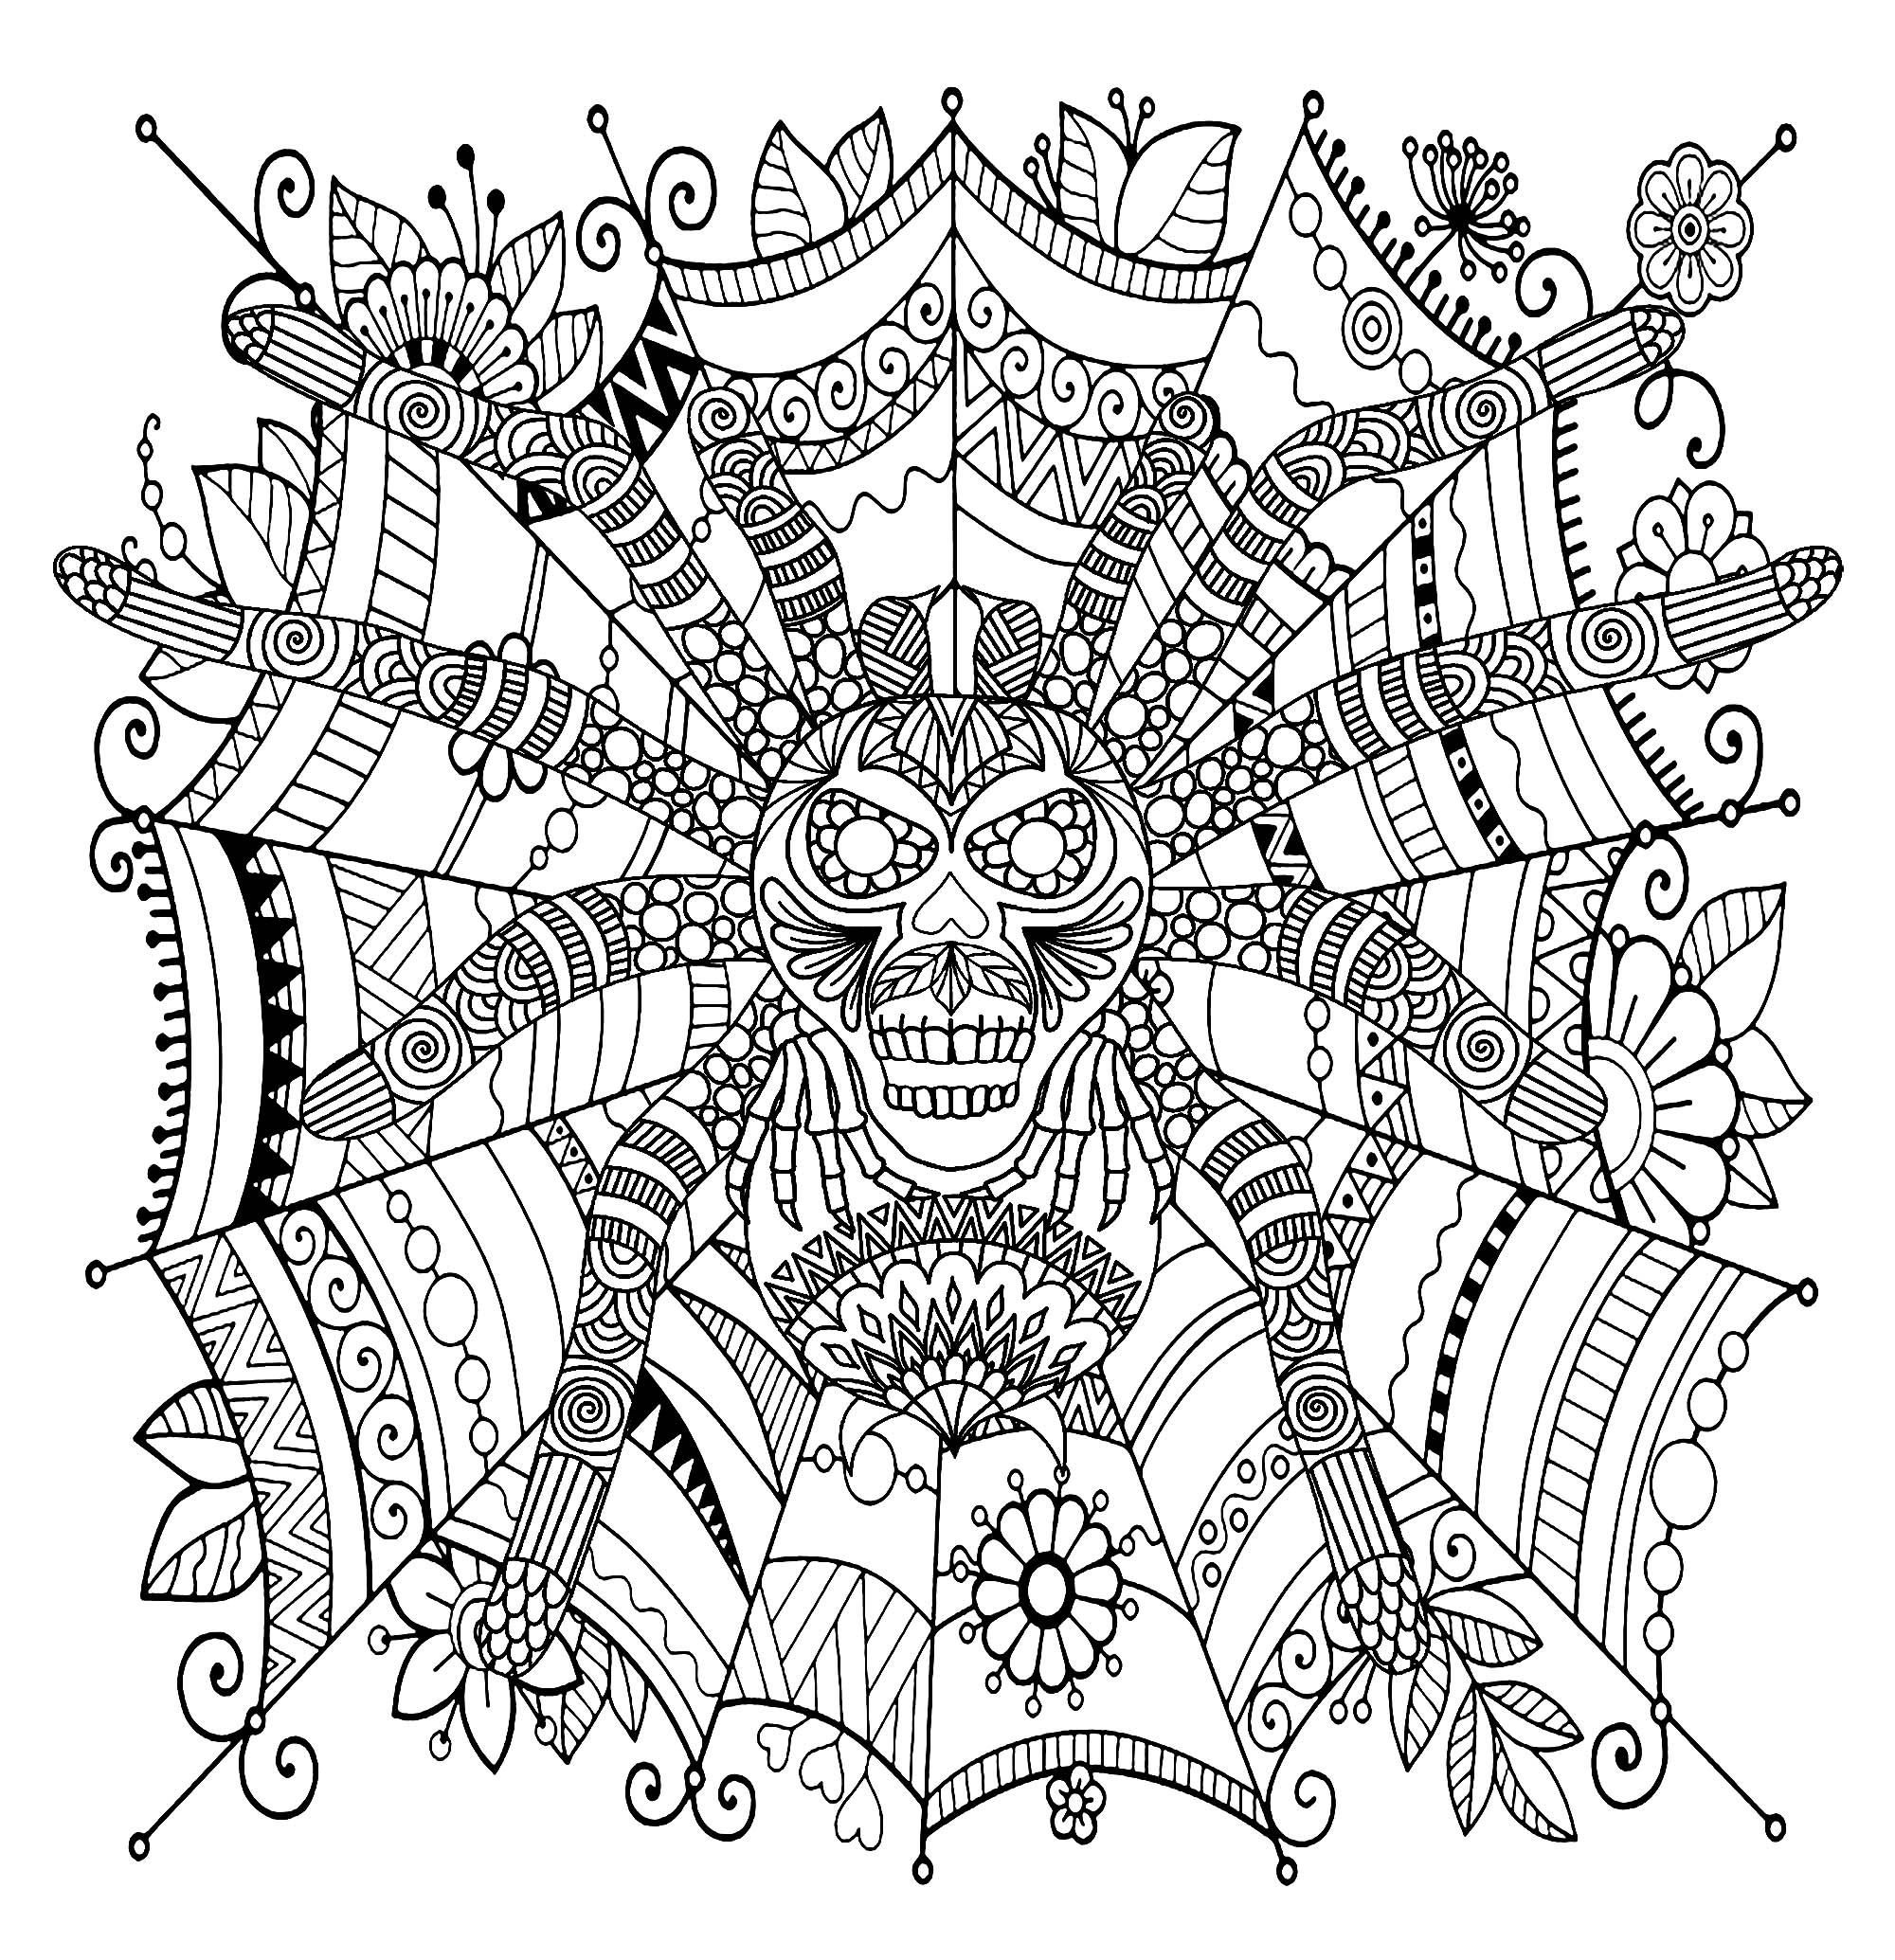 Spider Mandala - M&Alas Adult Coloring Pages concernant Coloriages